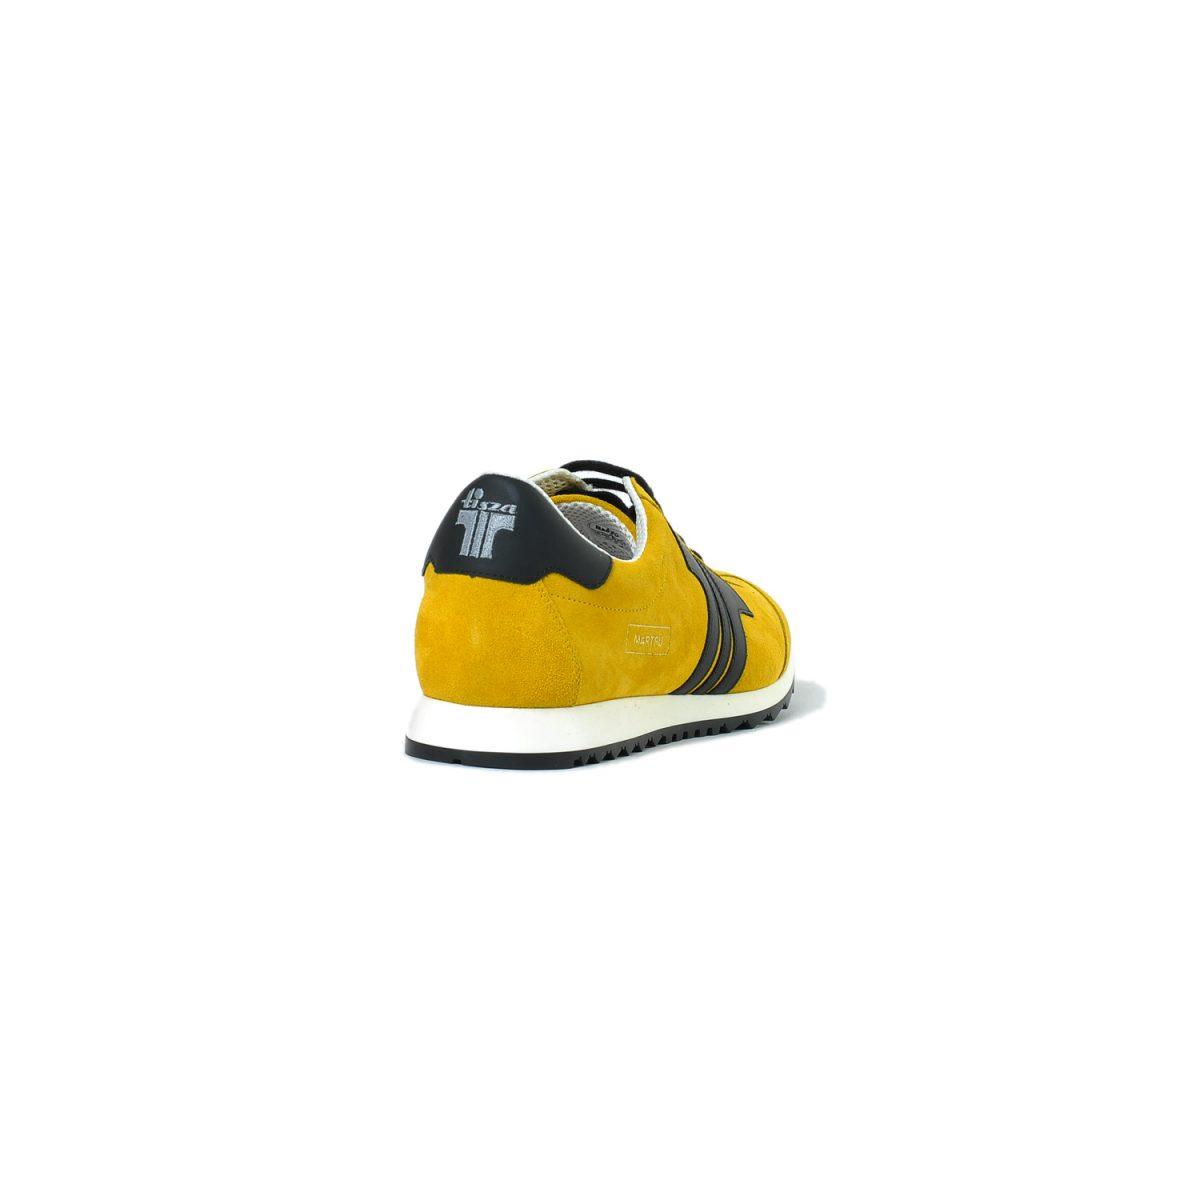 Tisza shoes - Martfű - Mustard-black